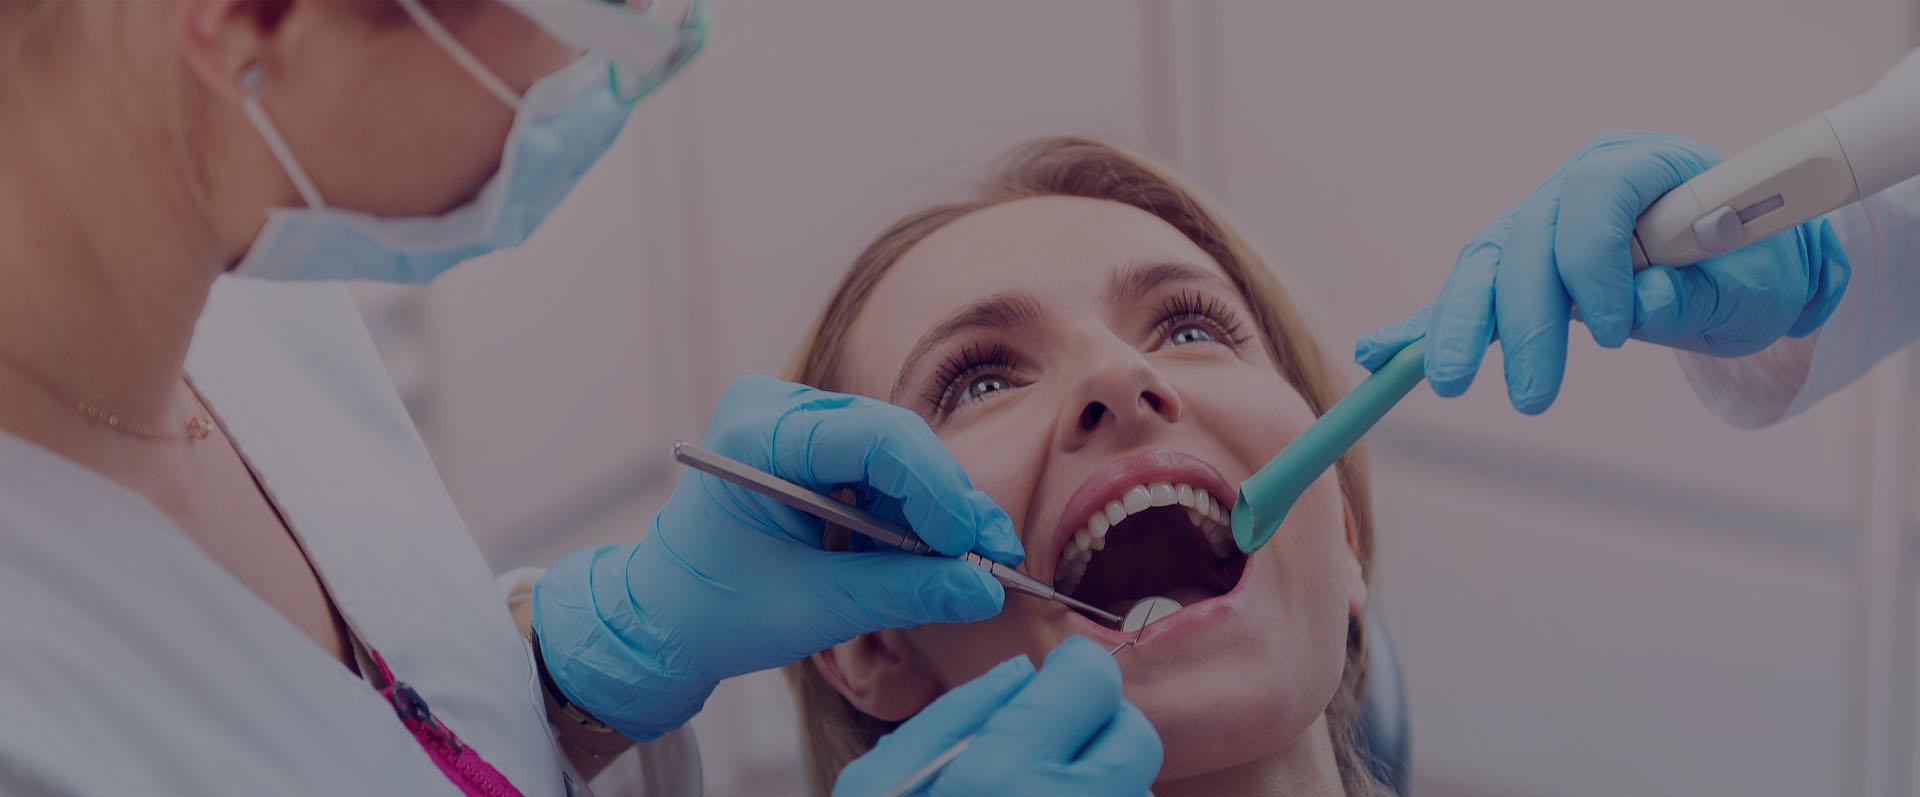 Consejos de higiene bucal